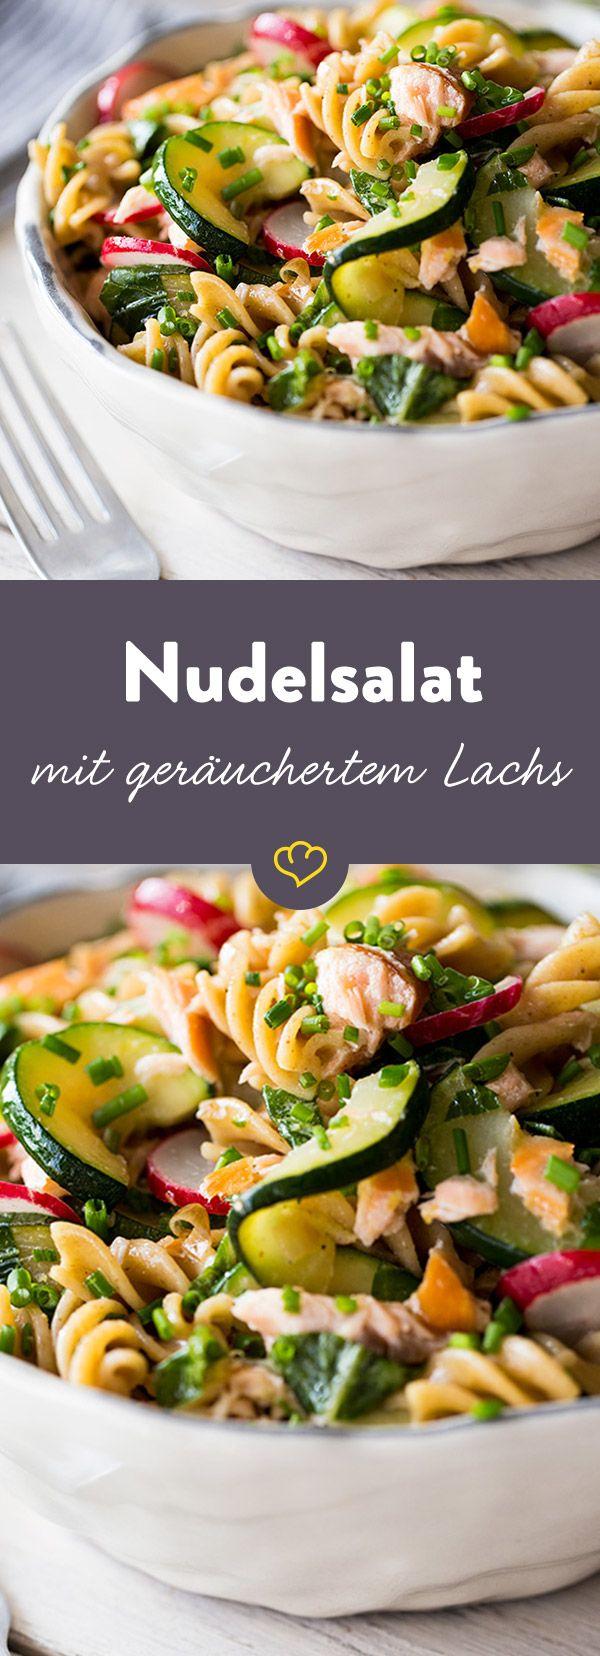 best 25 lachs nudeln ideas on pinterest lachs pasta lachs rezepte and nudeln mit lachs. Black Bedroom Furniture Sets. Home Design Ideas